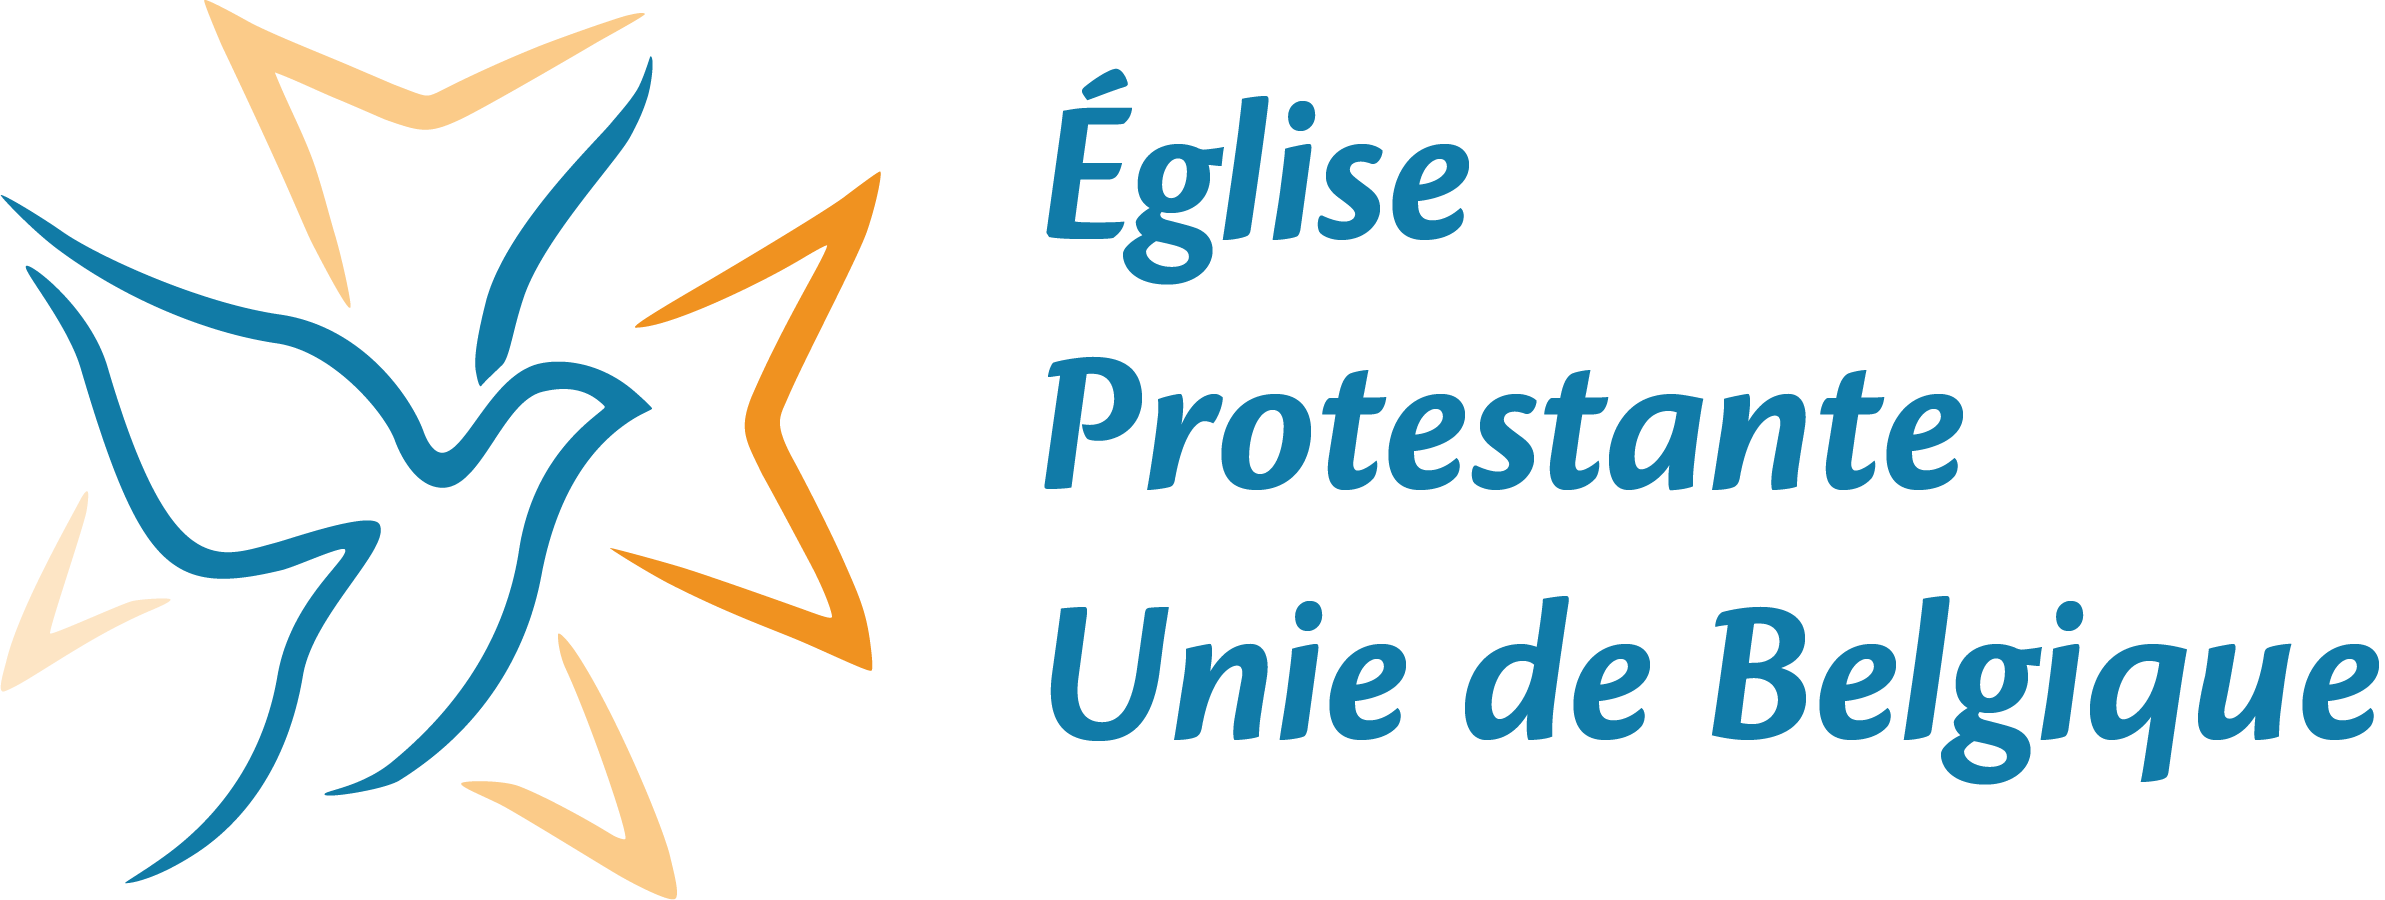 Eglise Protestante Unie de Belgique